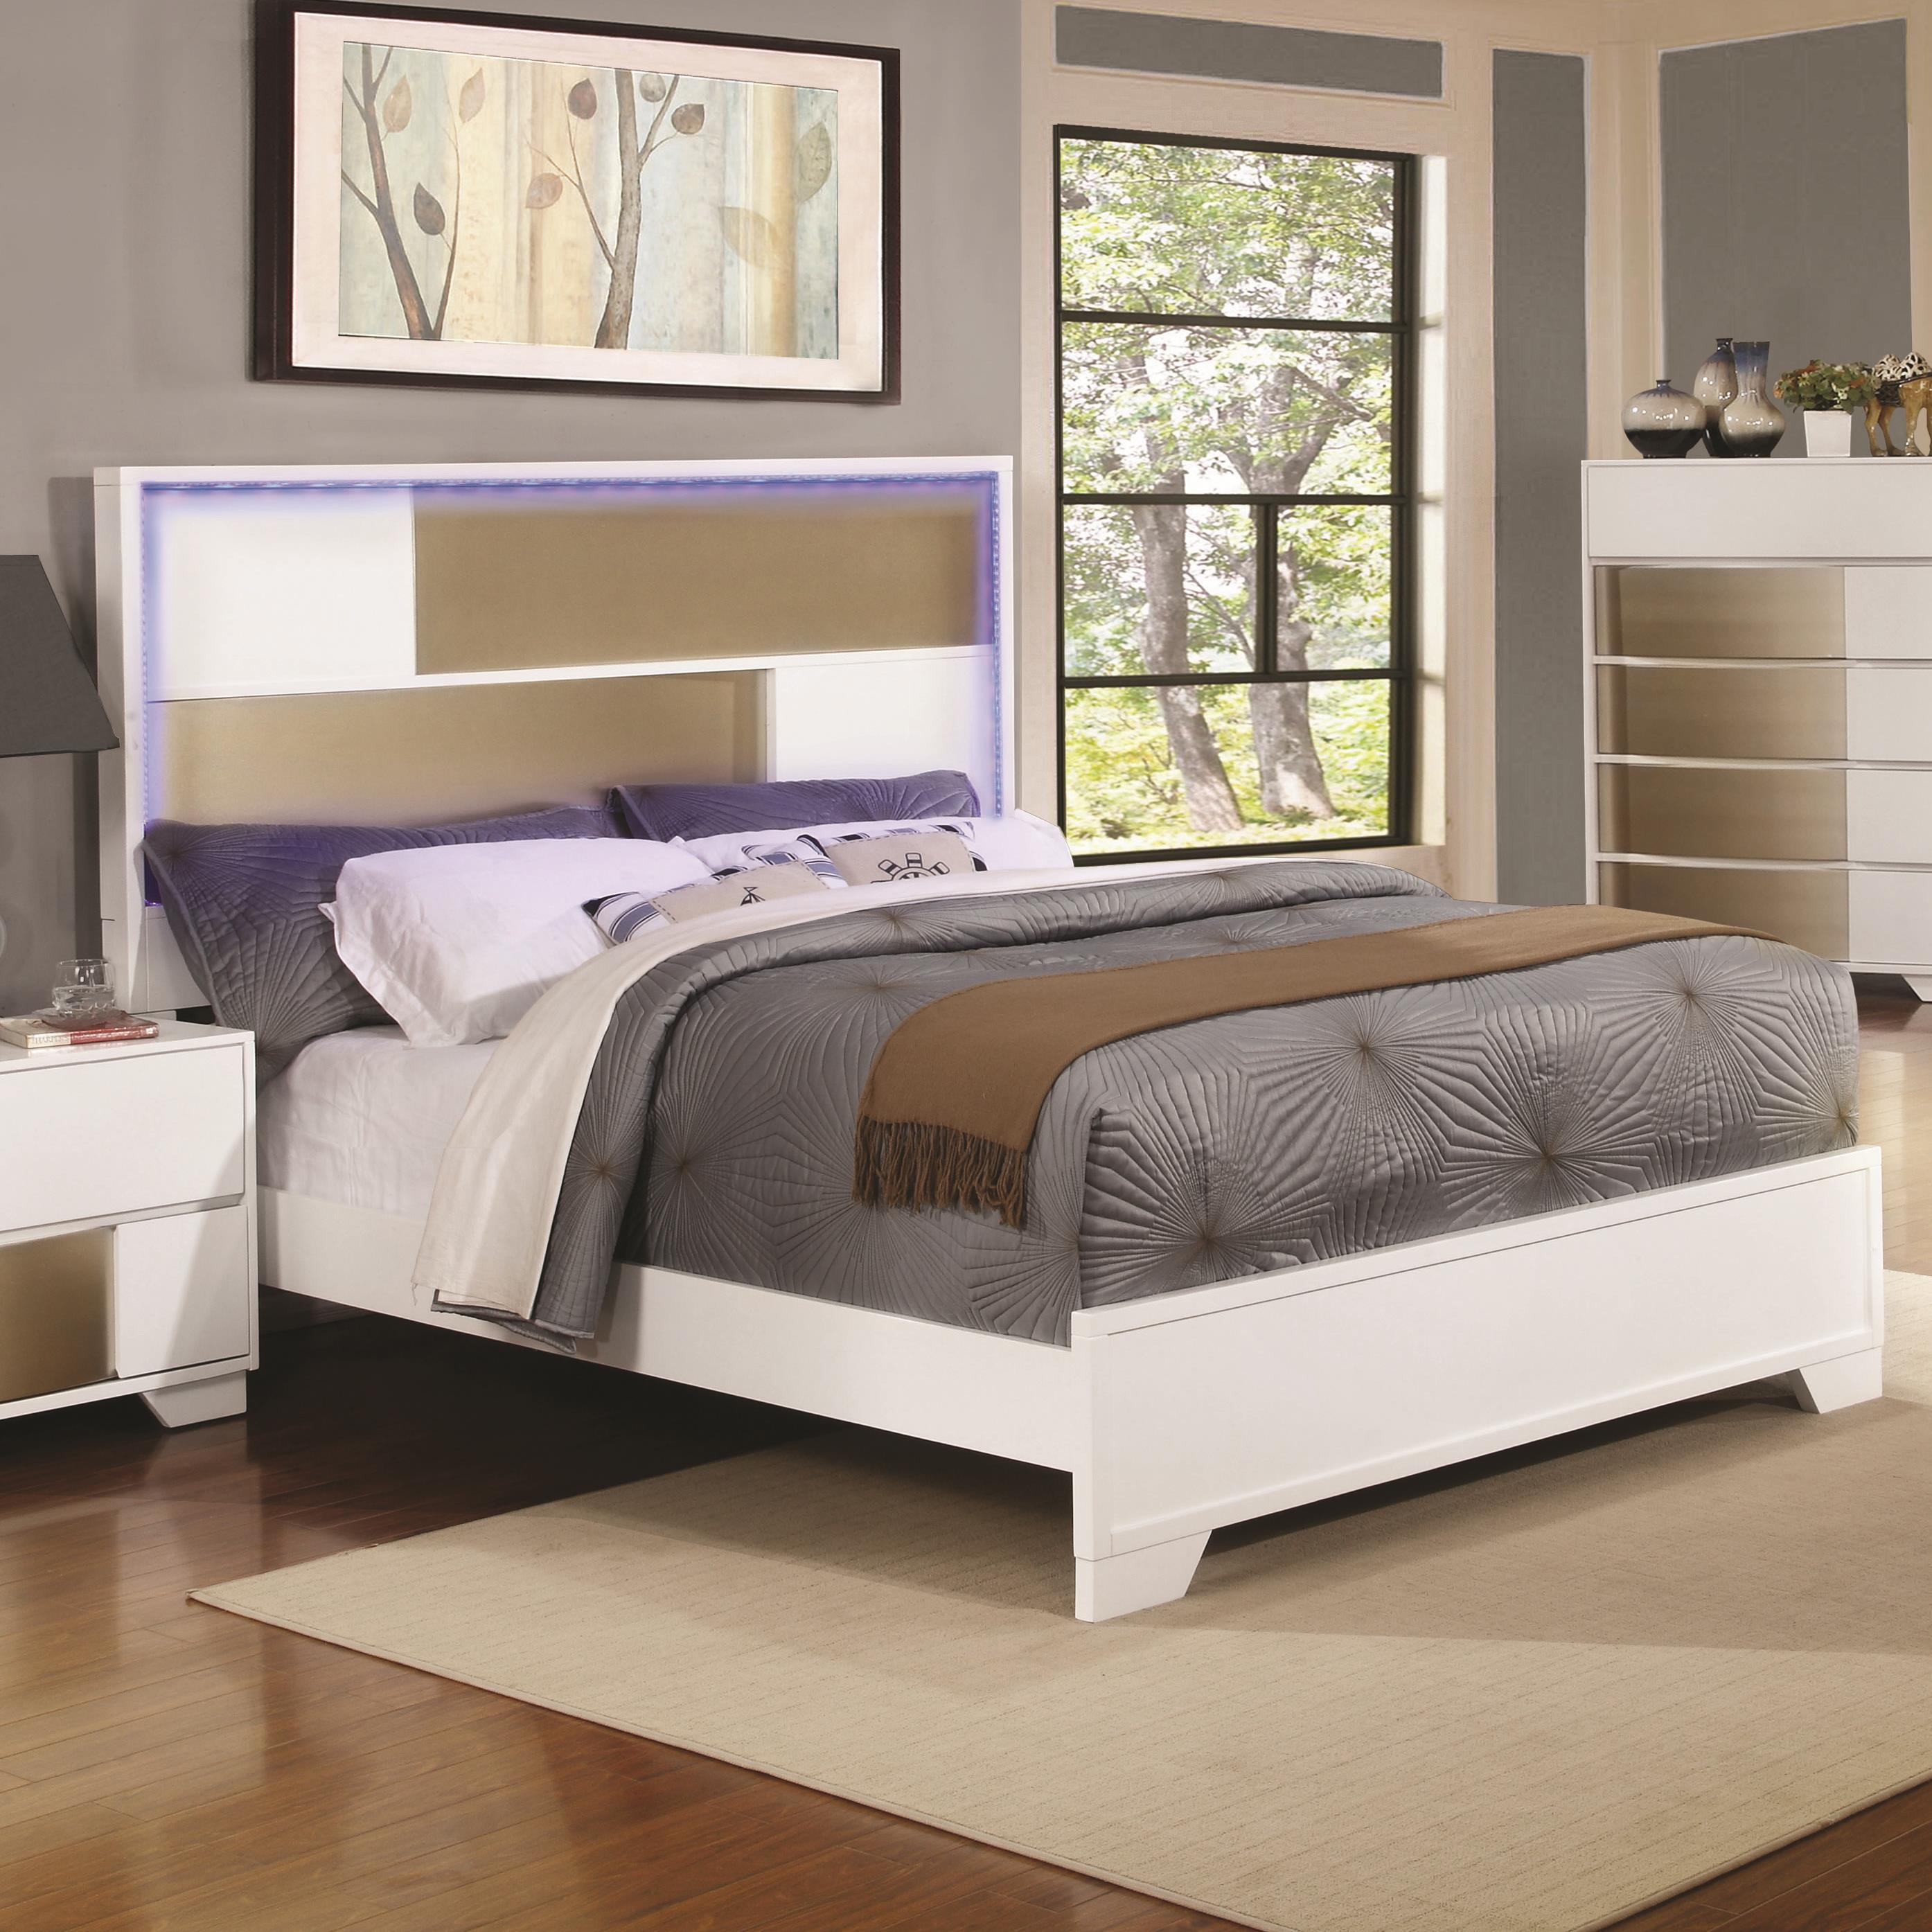 Coaster Havering Queen Bed - Item Number: 204741Q